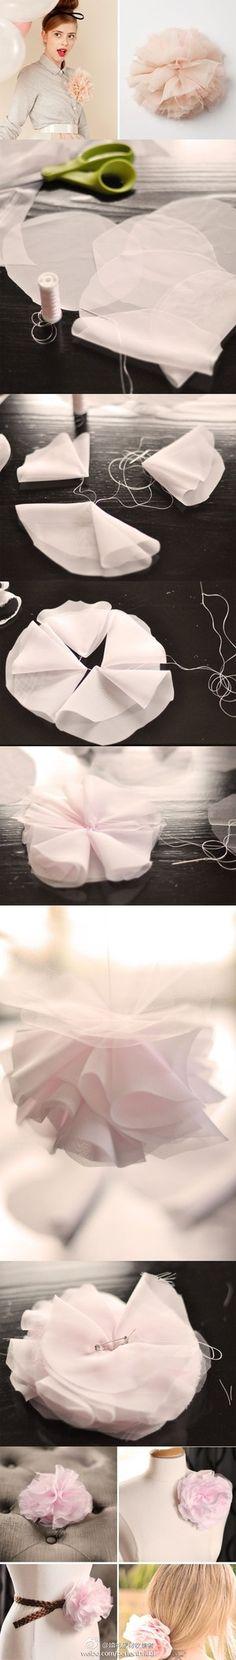 DIY粉色薄纱花朵 - 堆糖 发现生活_收集美好_分享图片